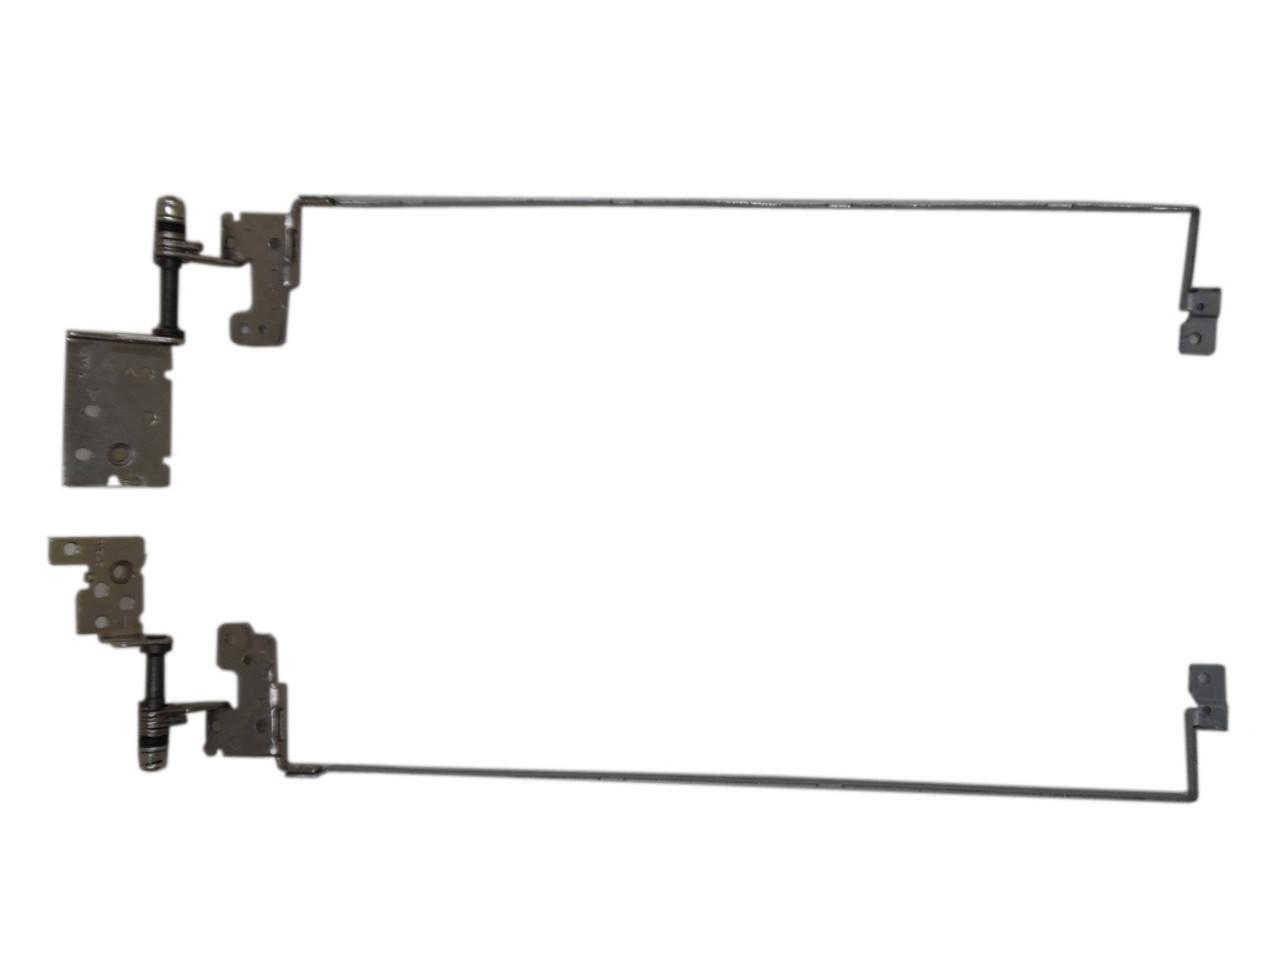 Laptop Keyboard for Sony VAIO SVE15 V133846DK3TR 149092511TR AEHK5A021203A Turkey TR Black with Gray Frame